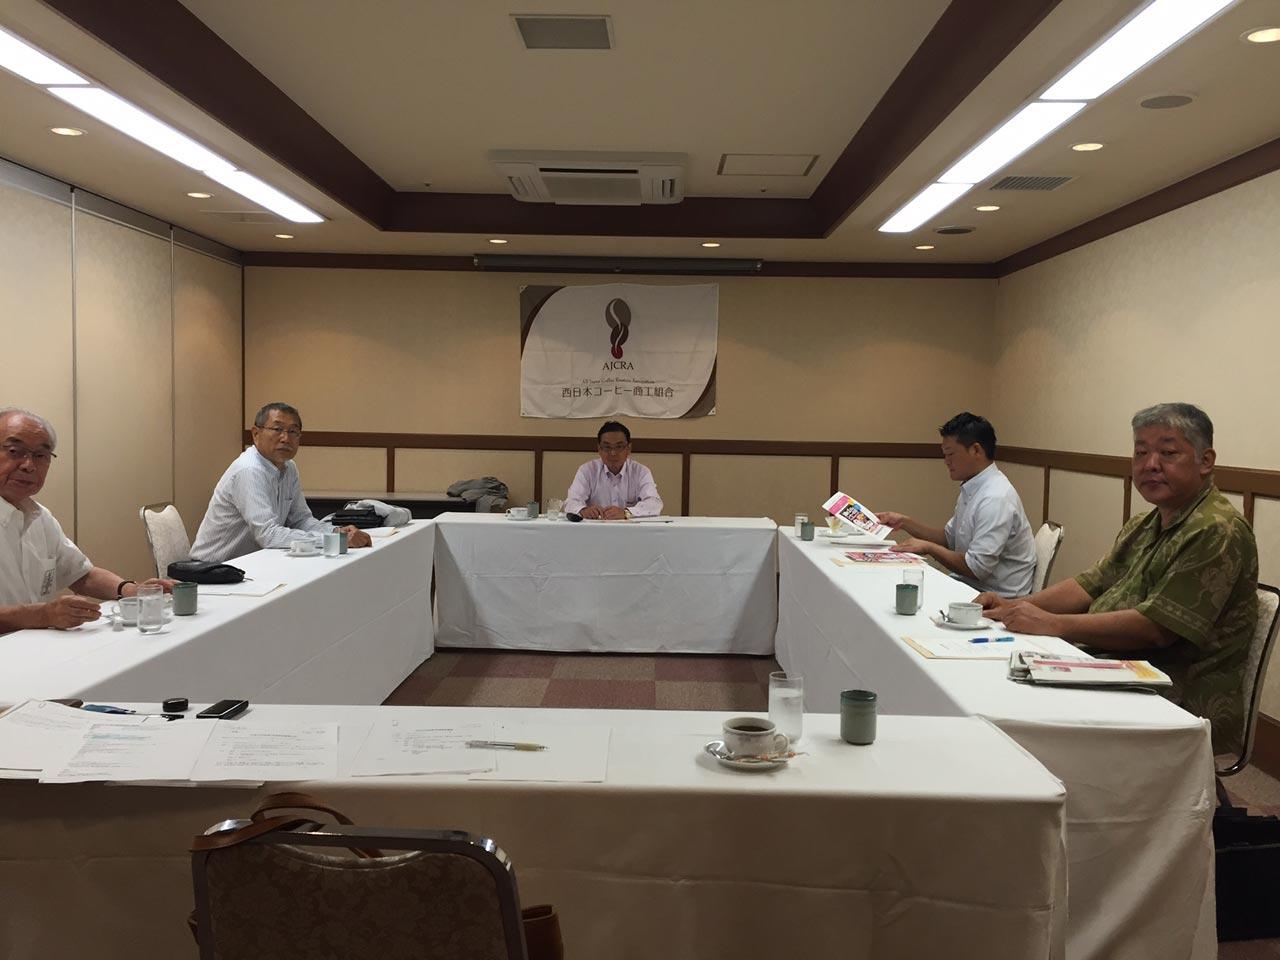 西日本コーヒー商工組合 第2回理事会を開催